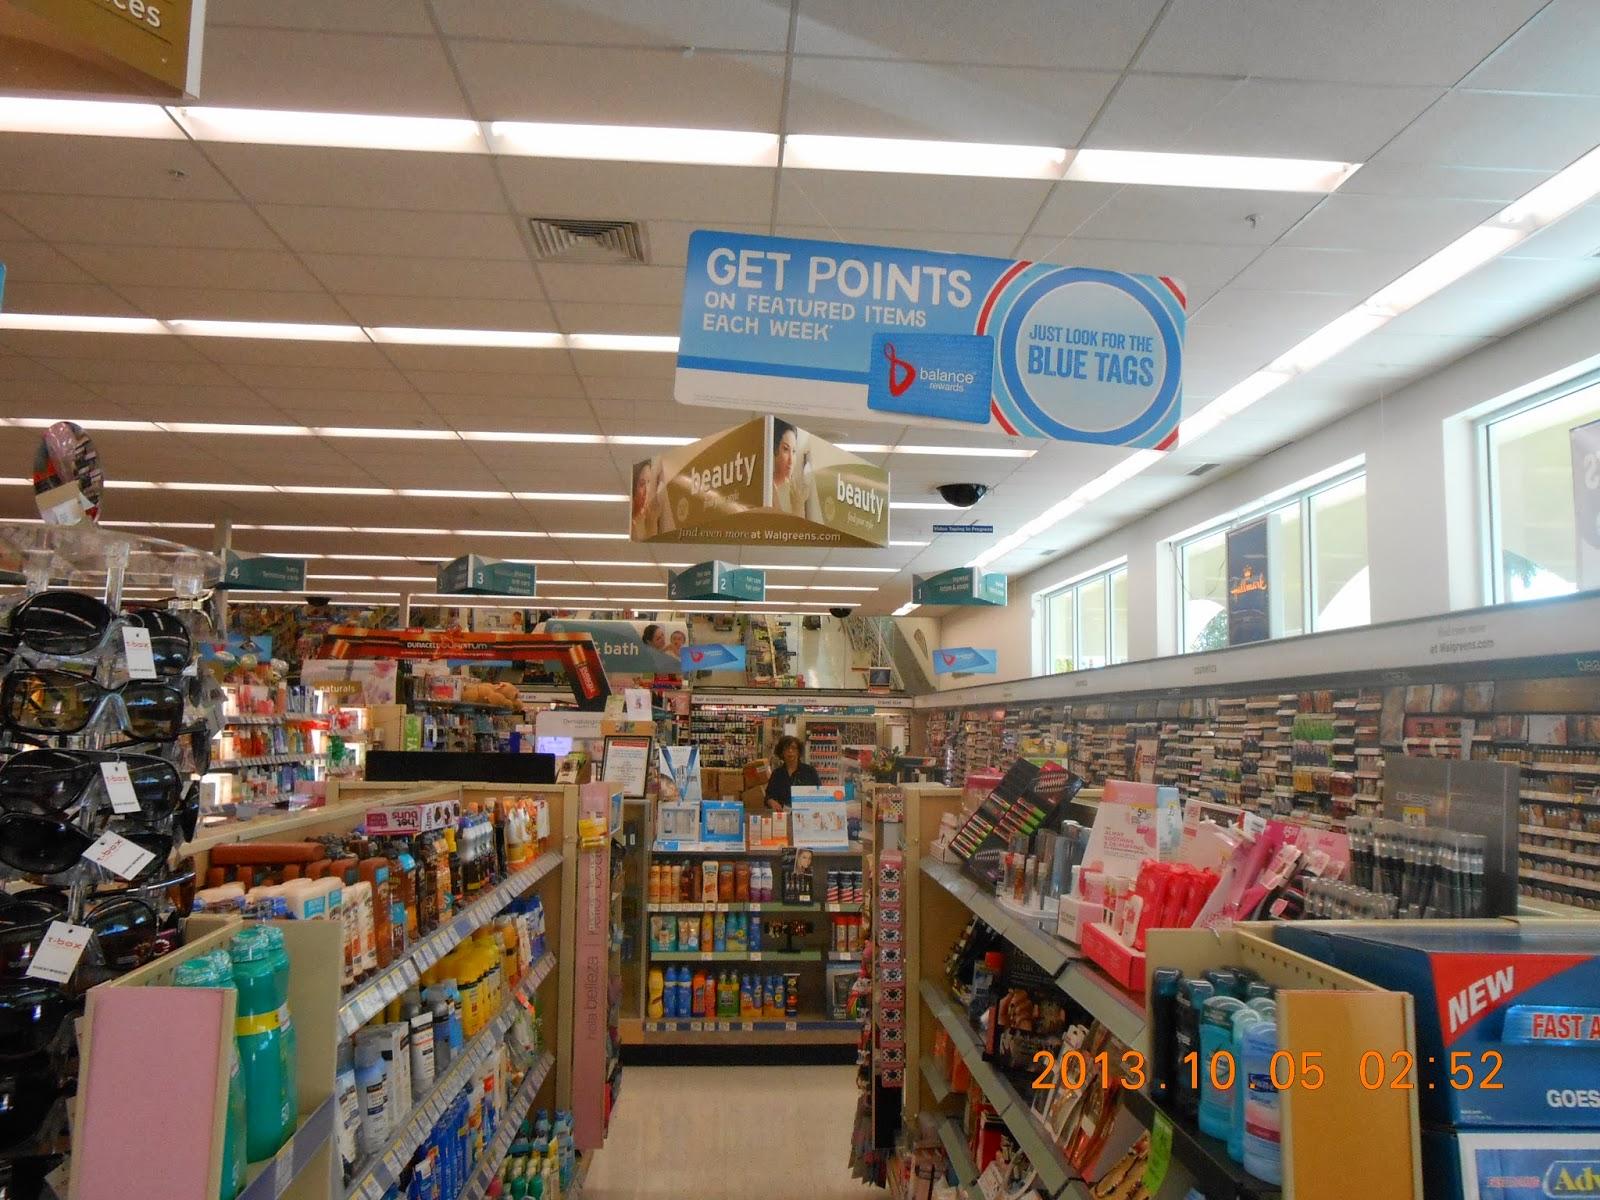 The Wag - The Walgreens Blog: Walgreens (441) Coconut Creek FL